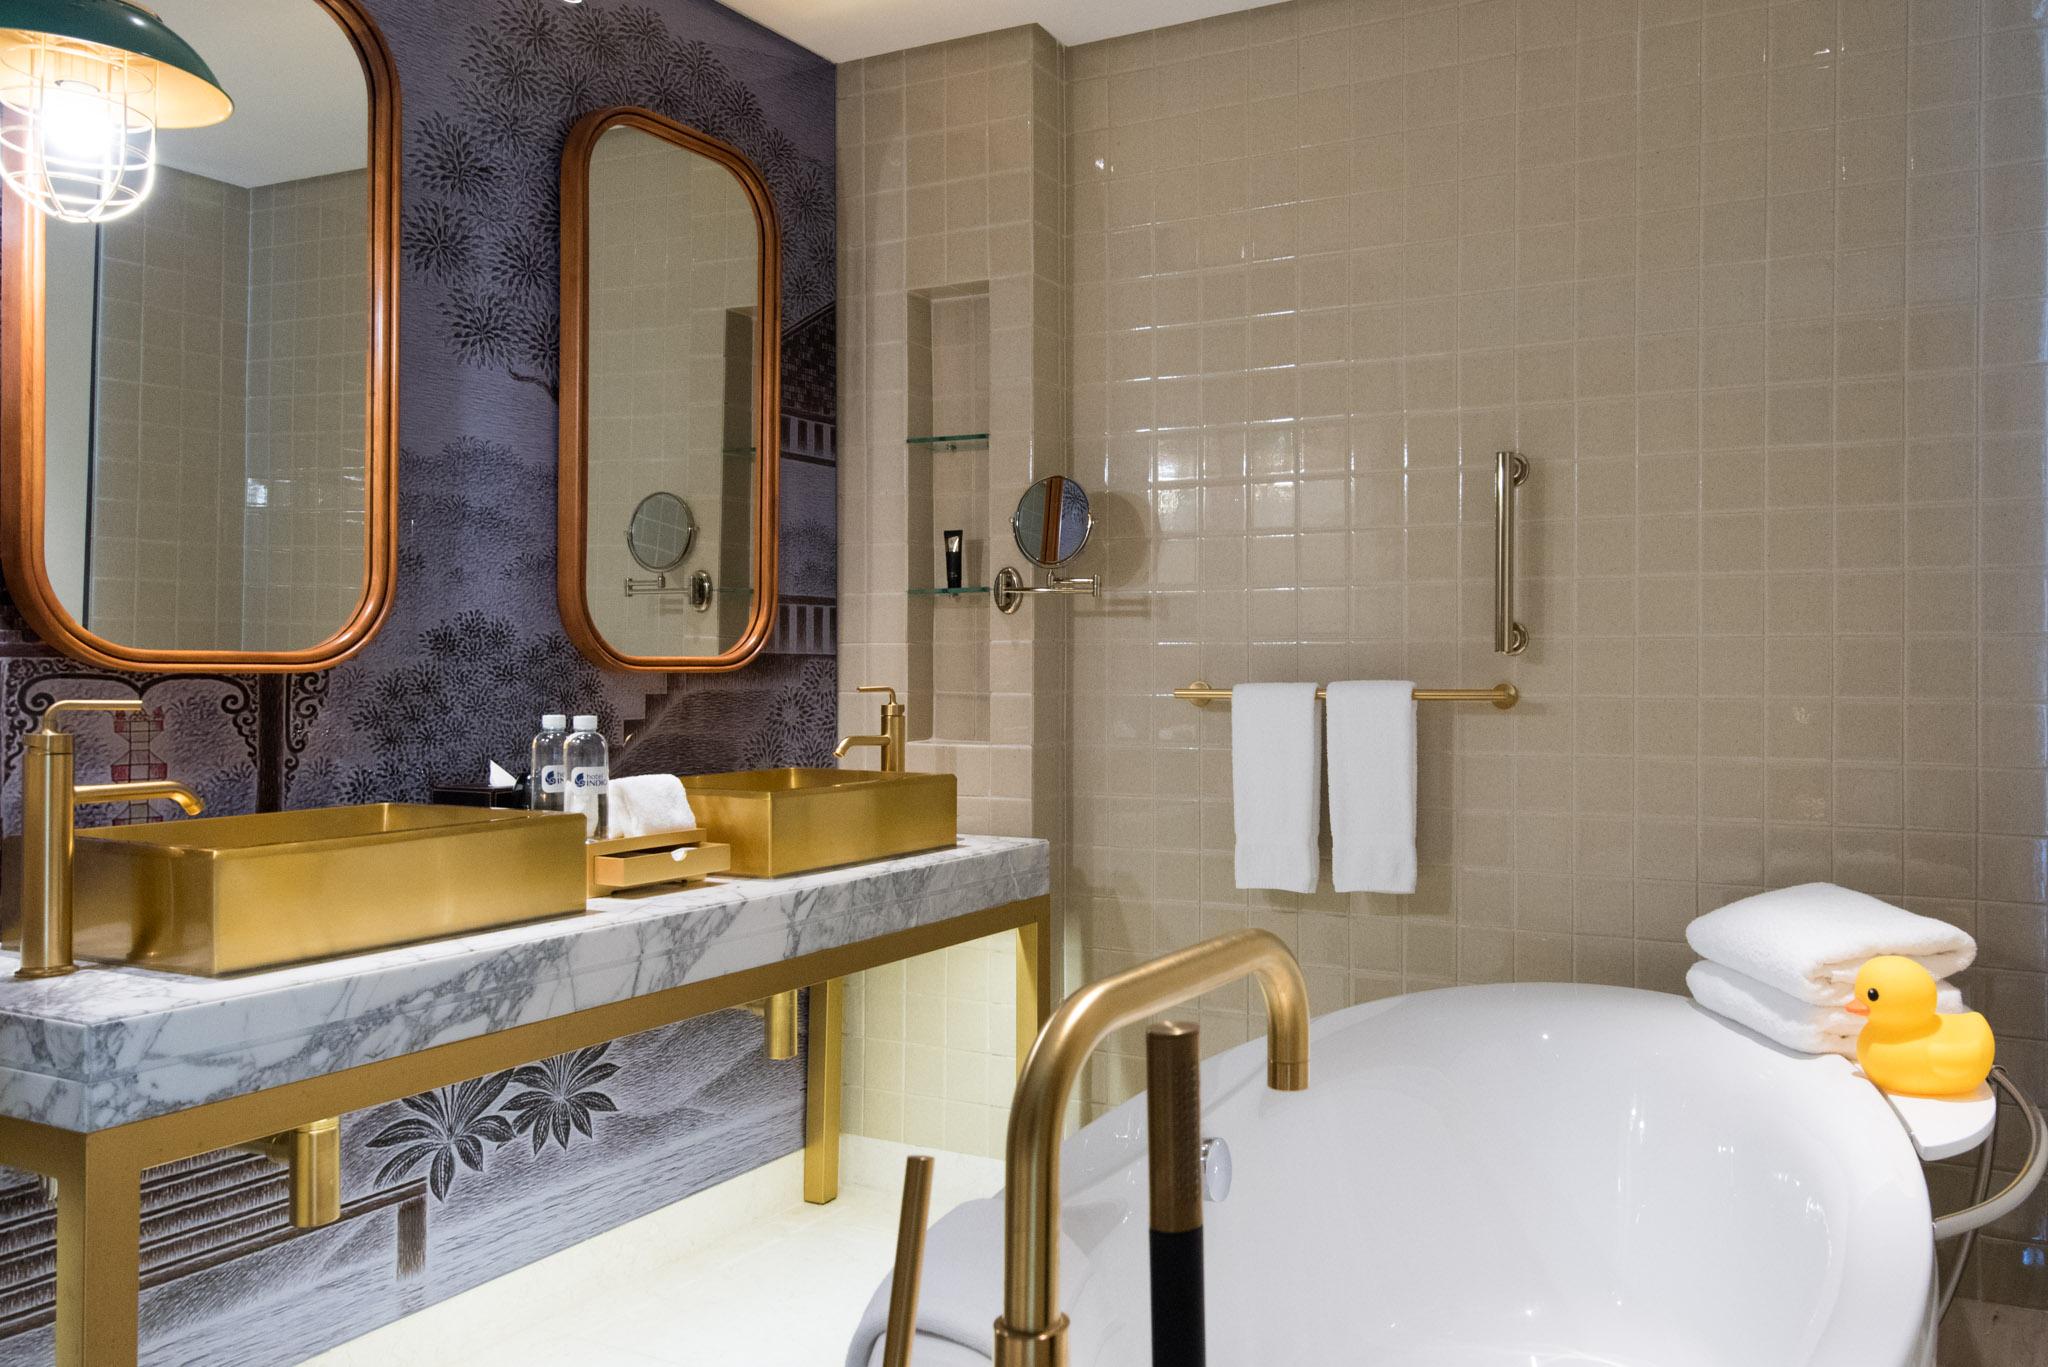 Chaiyapruek Executive Room (Bathroom) - Hotel Indigo Bangkok Wireless Road